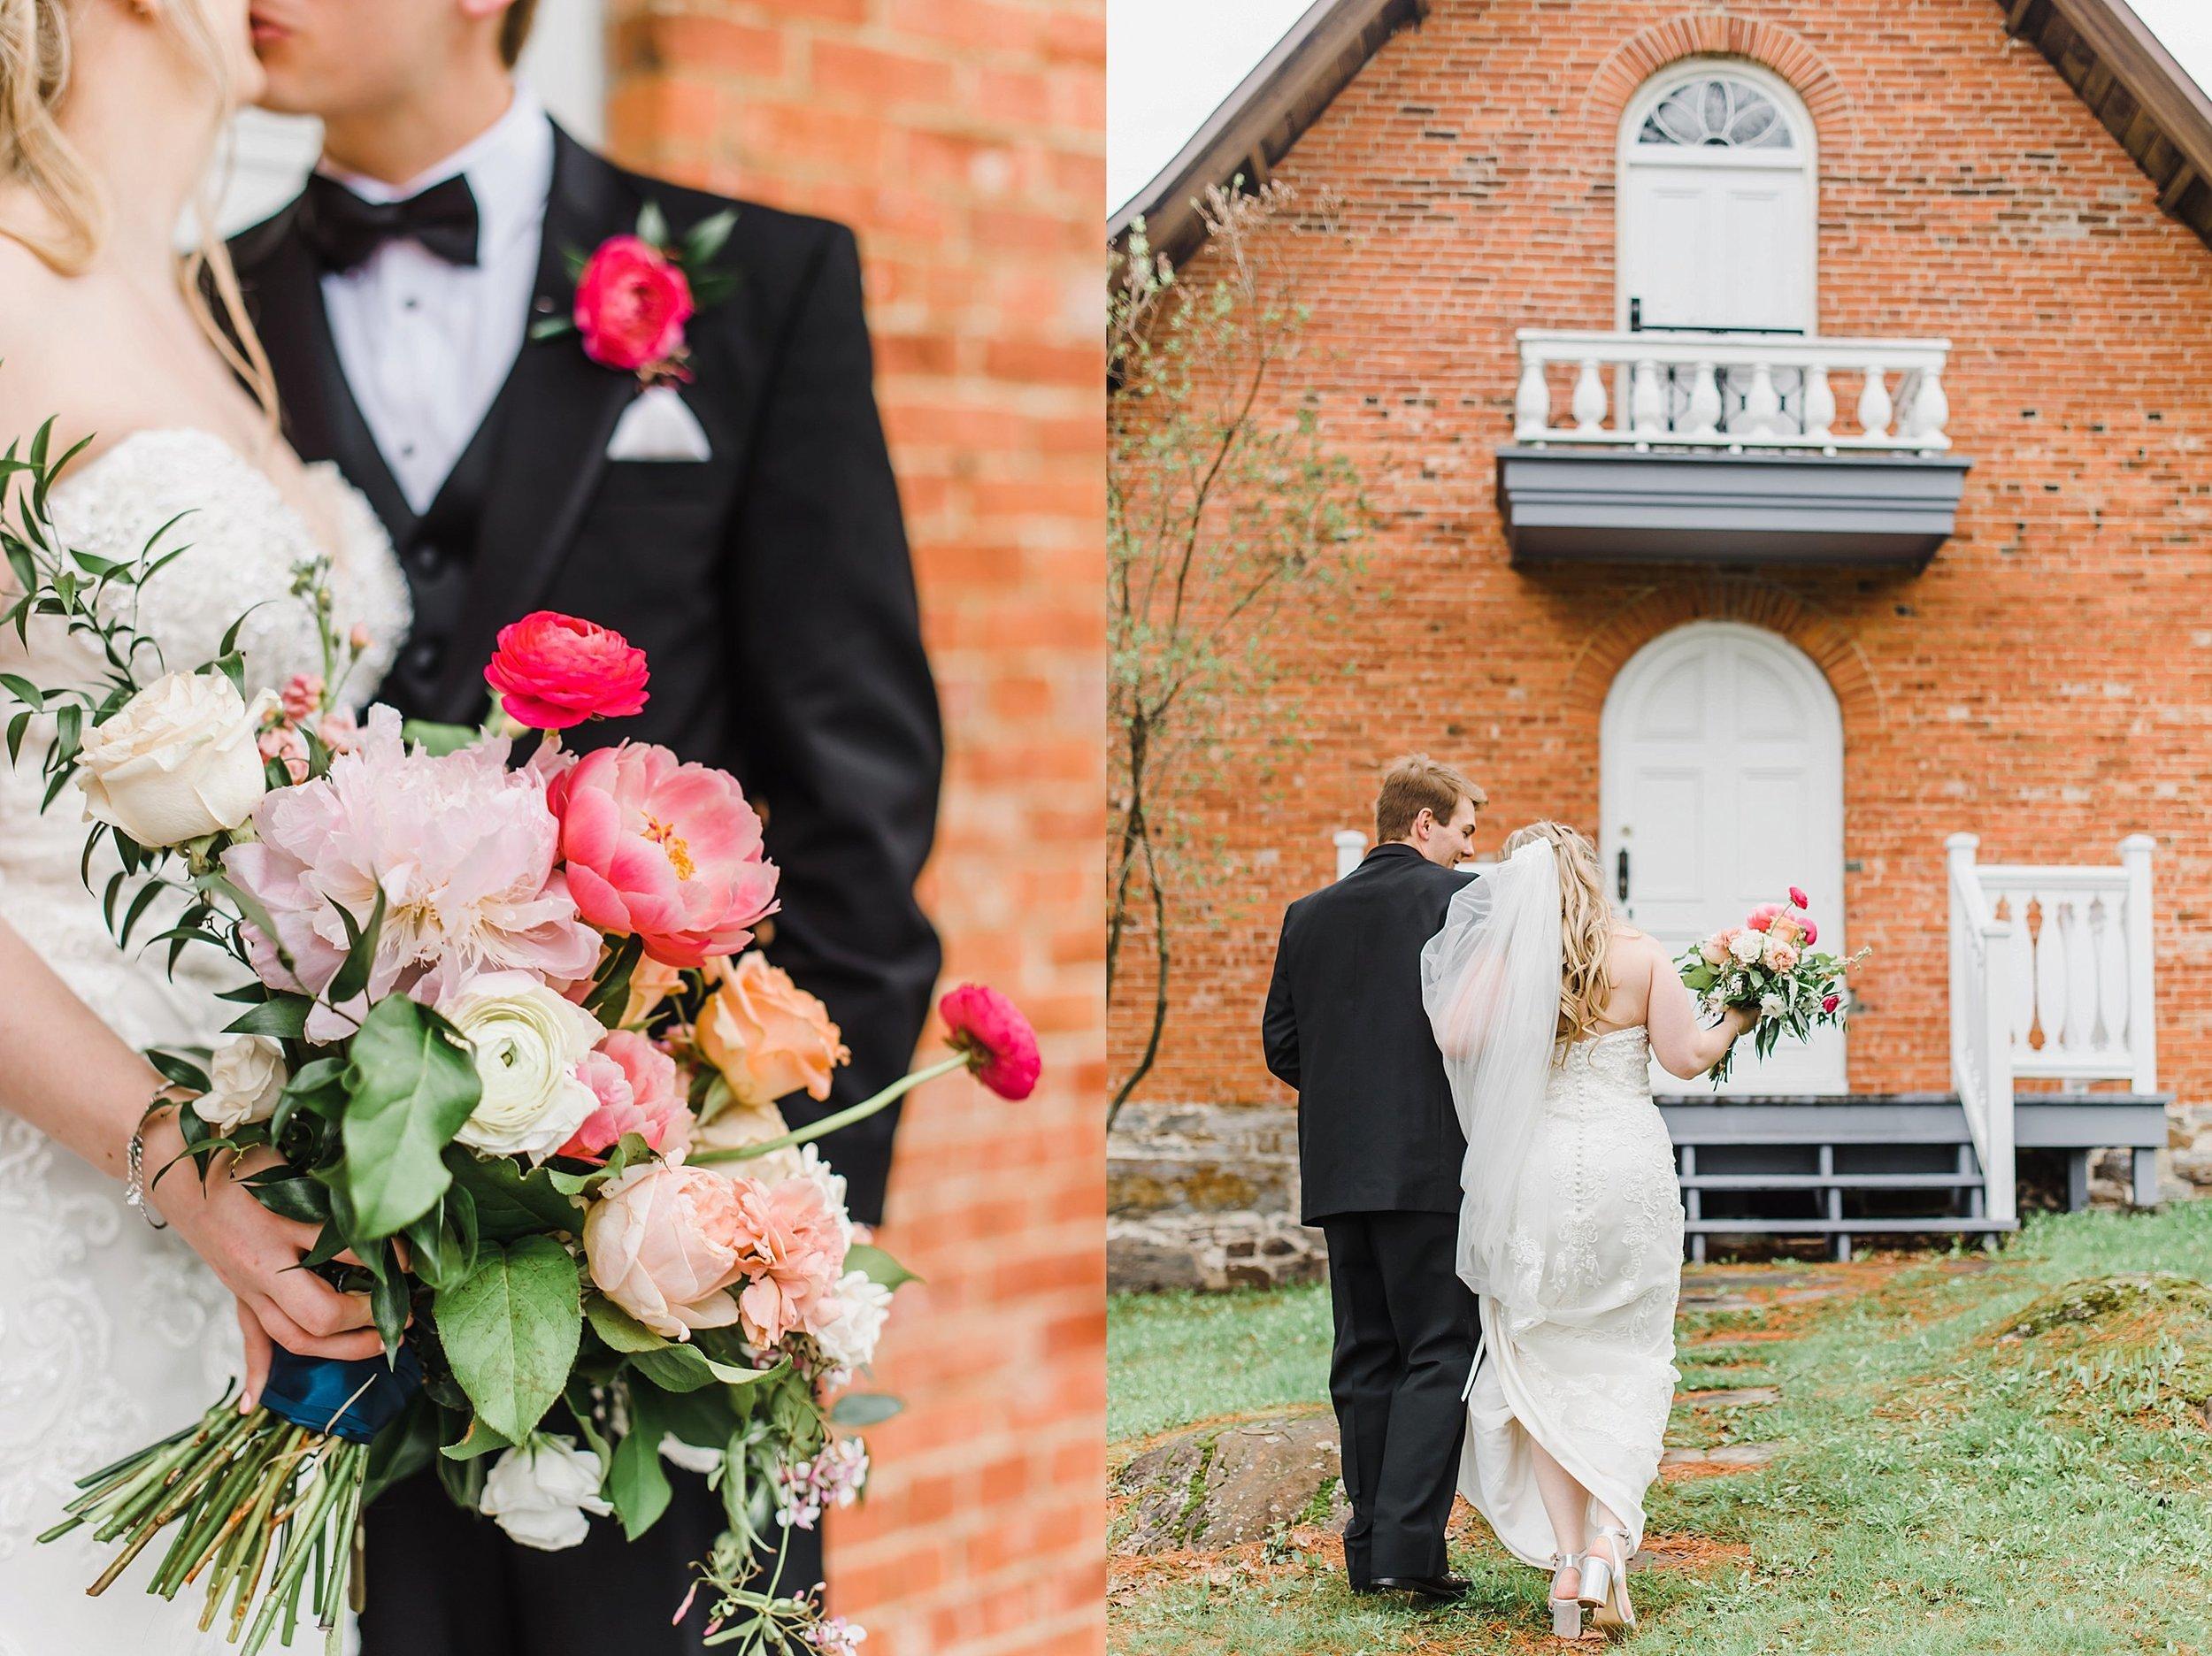 light airy indie fine art ottawa wedding photographer | Ali and Batoul Photography_0179.jpg